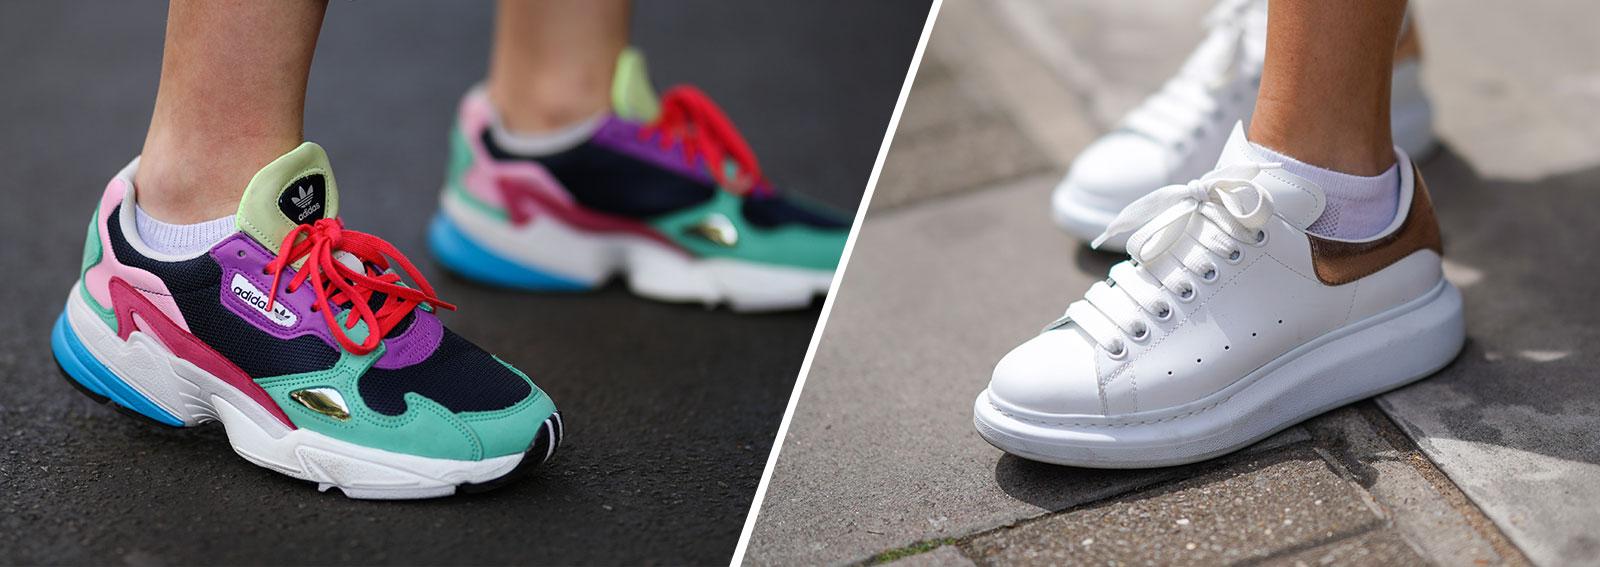 sneakers-FW-2019-DESK